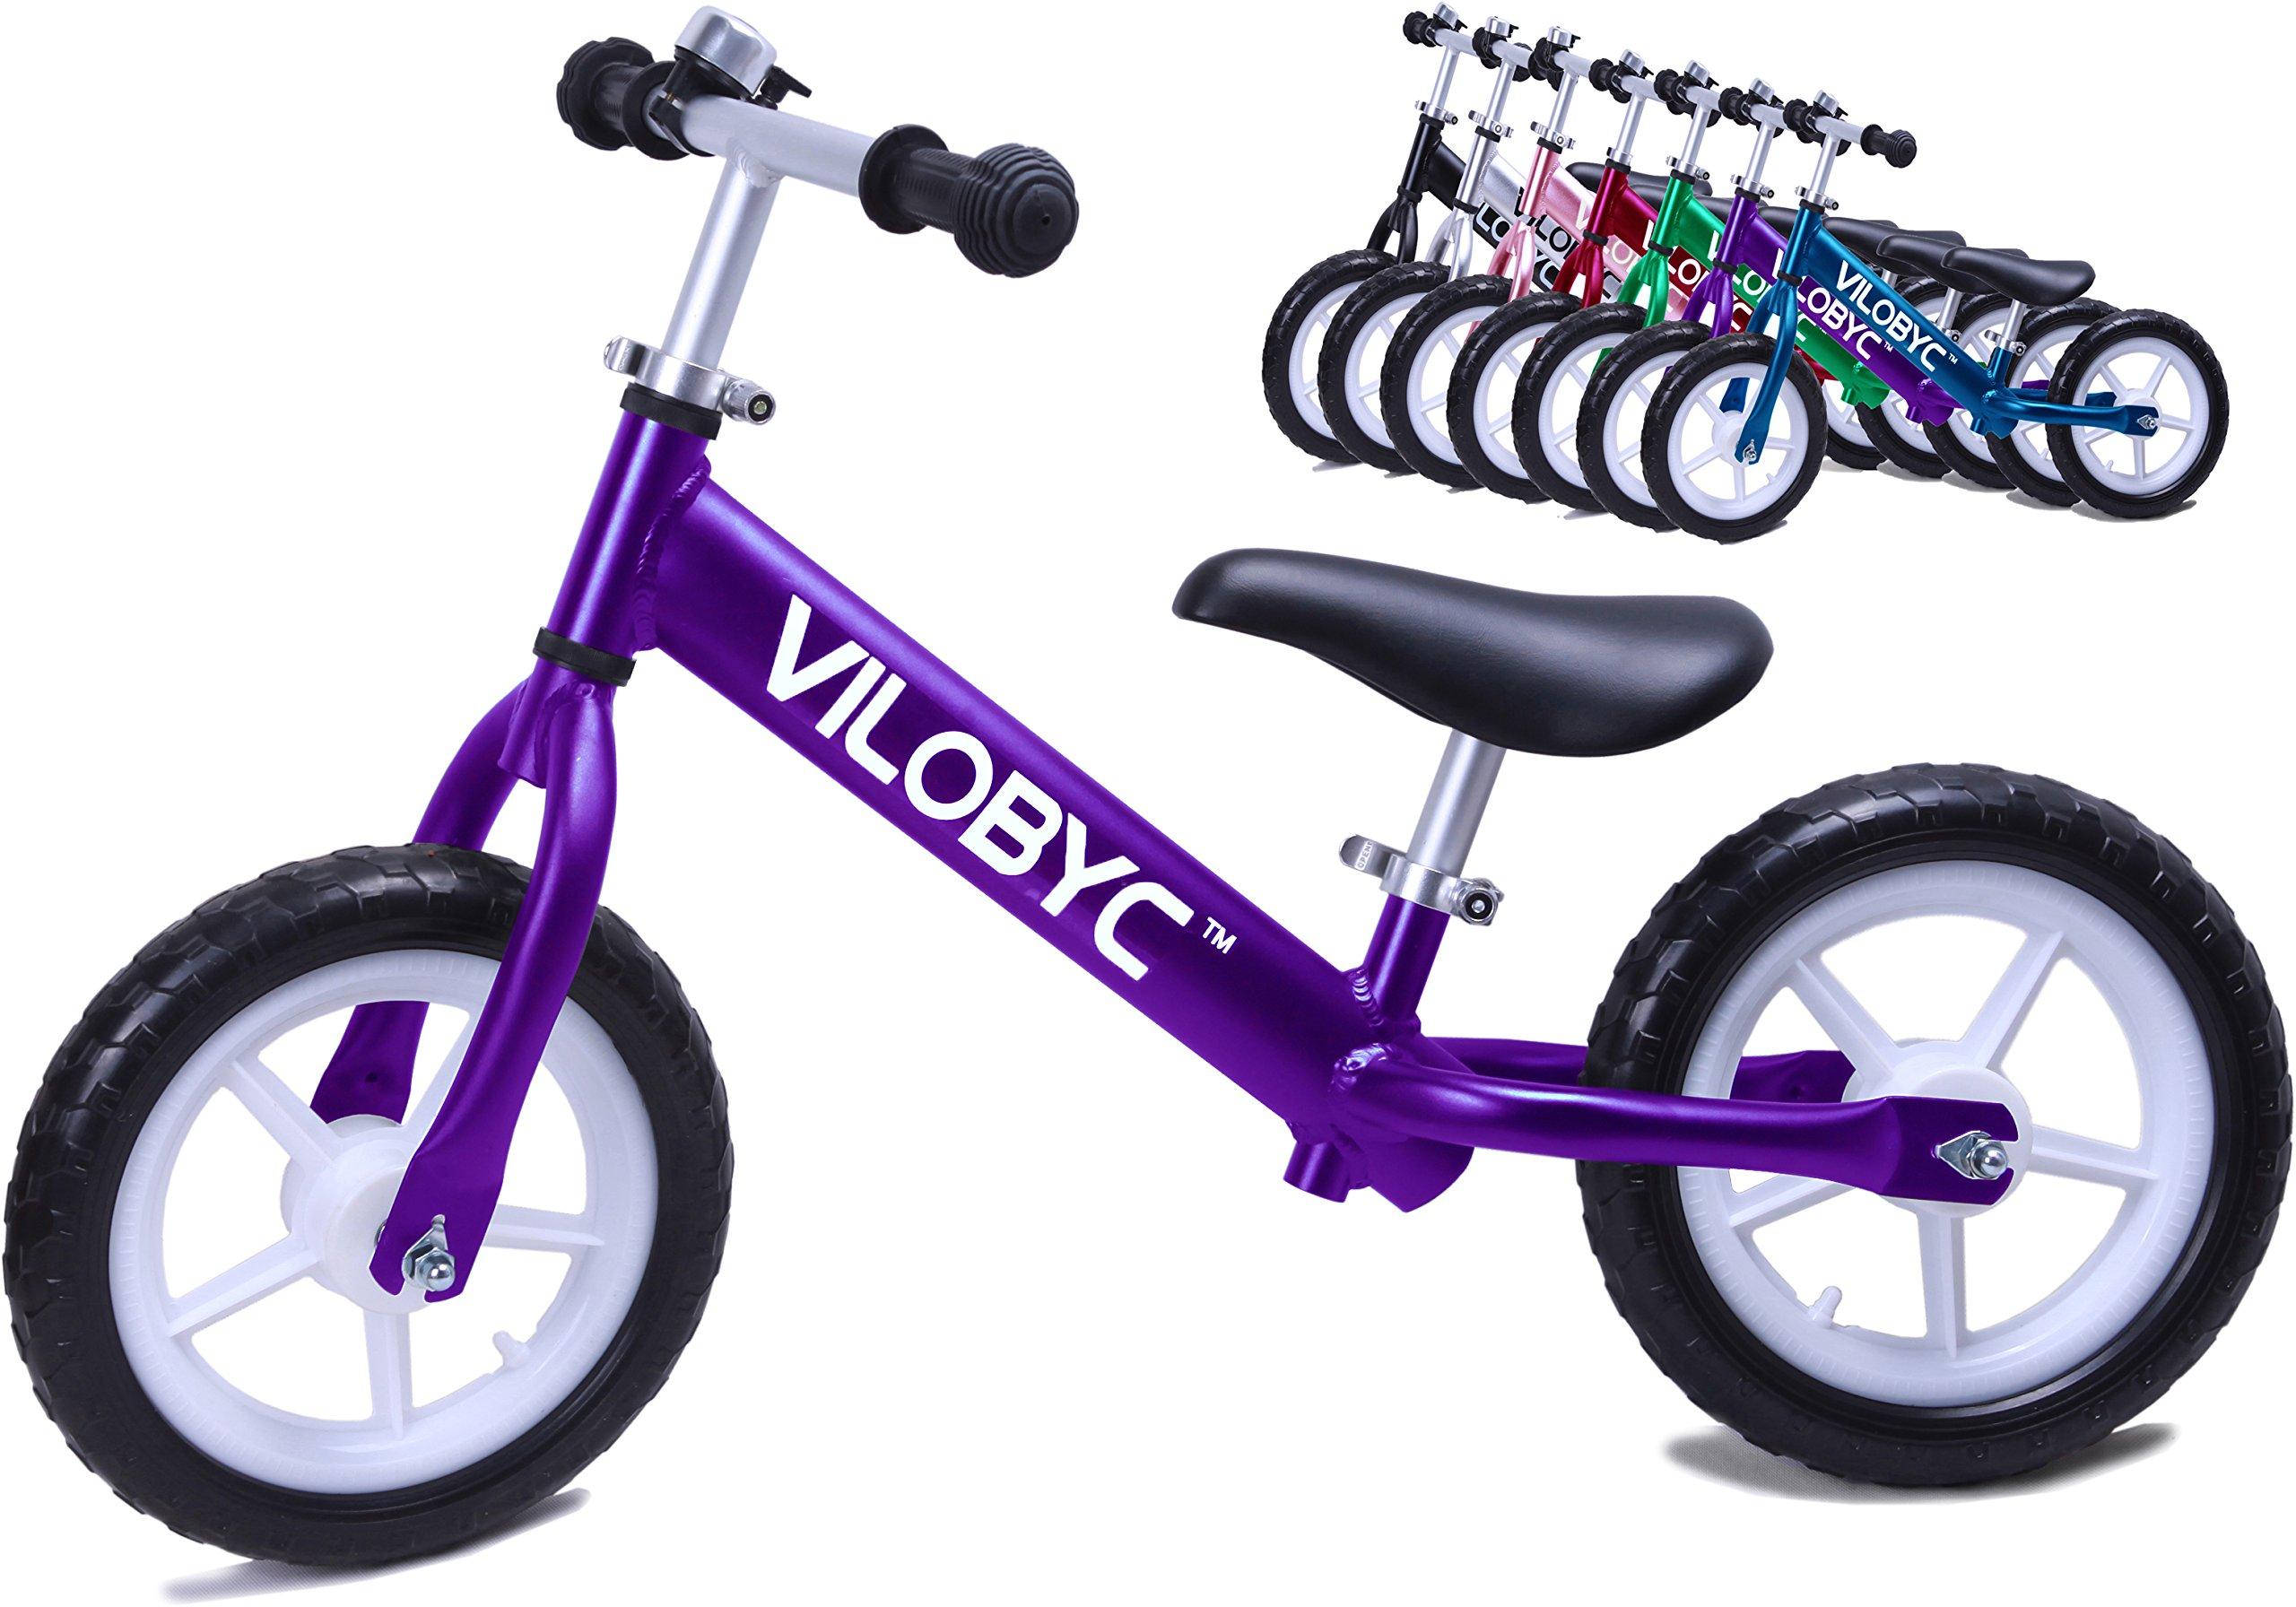 VILOBYC 12'' Anodised Aluminium Alloy Kids Push Ultralight Balance Bike (4.3 lbs) Child 18 Month to 5 Years Old Bicycle